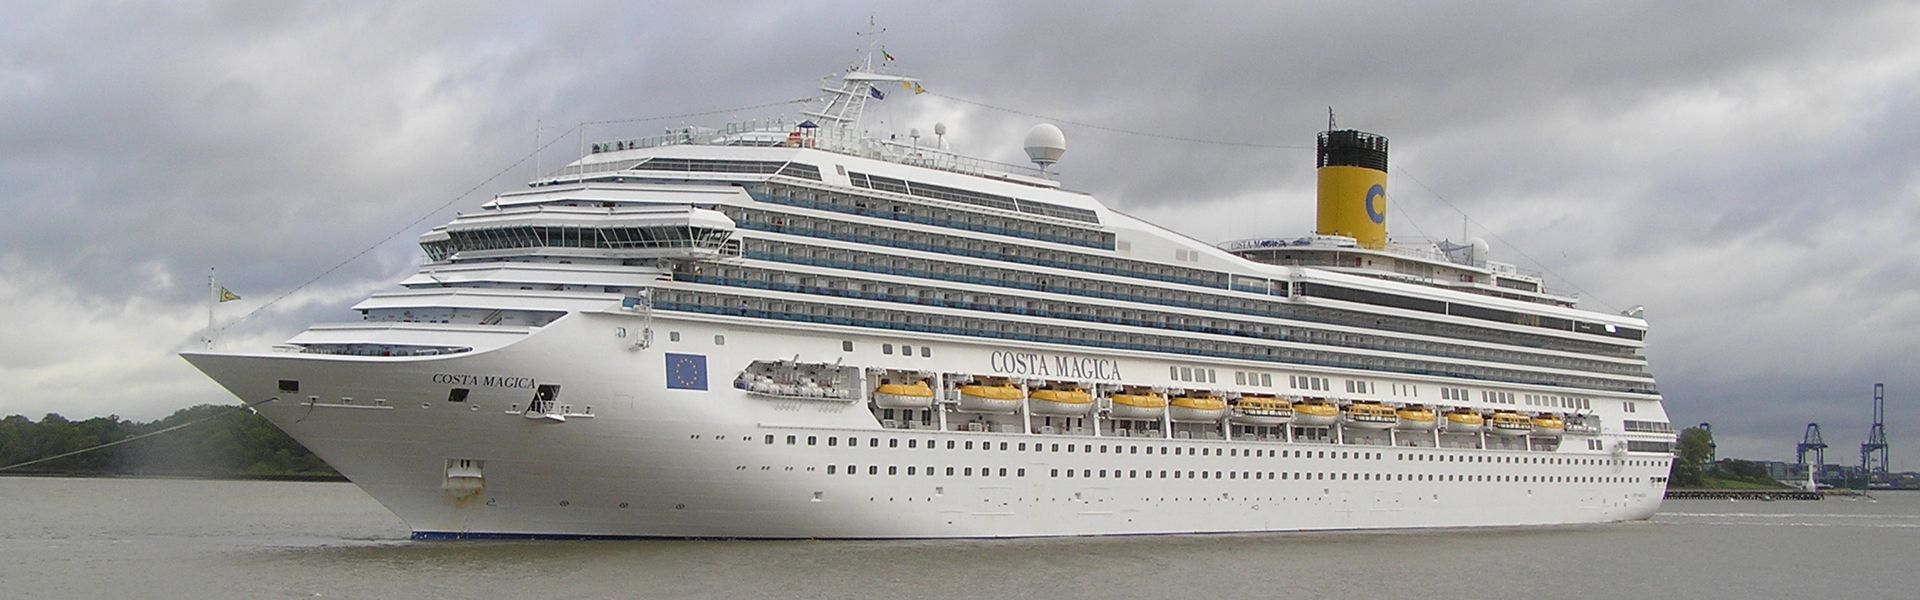 Croaziera 2017 - Transatlantic si Repozitionari (Buenos Aires) - Costa Cruises - Costa Pacifica - 22 nopti